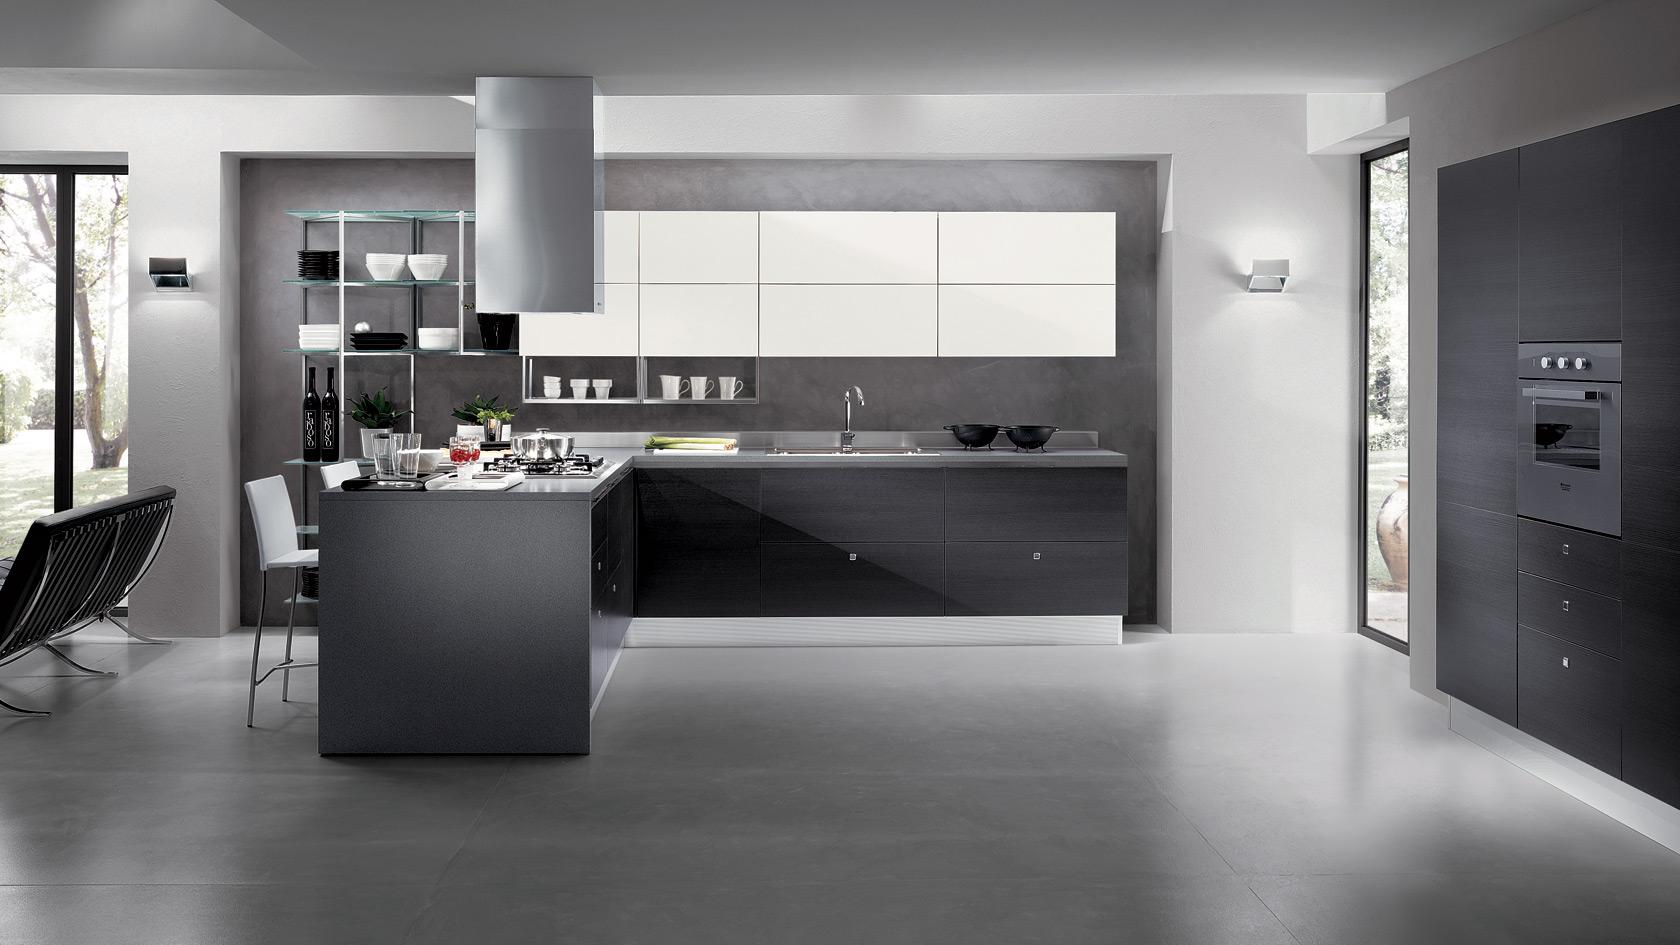 Un design originale per le cucine moderne | Antares